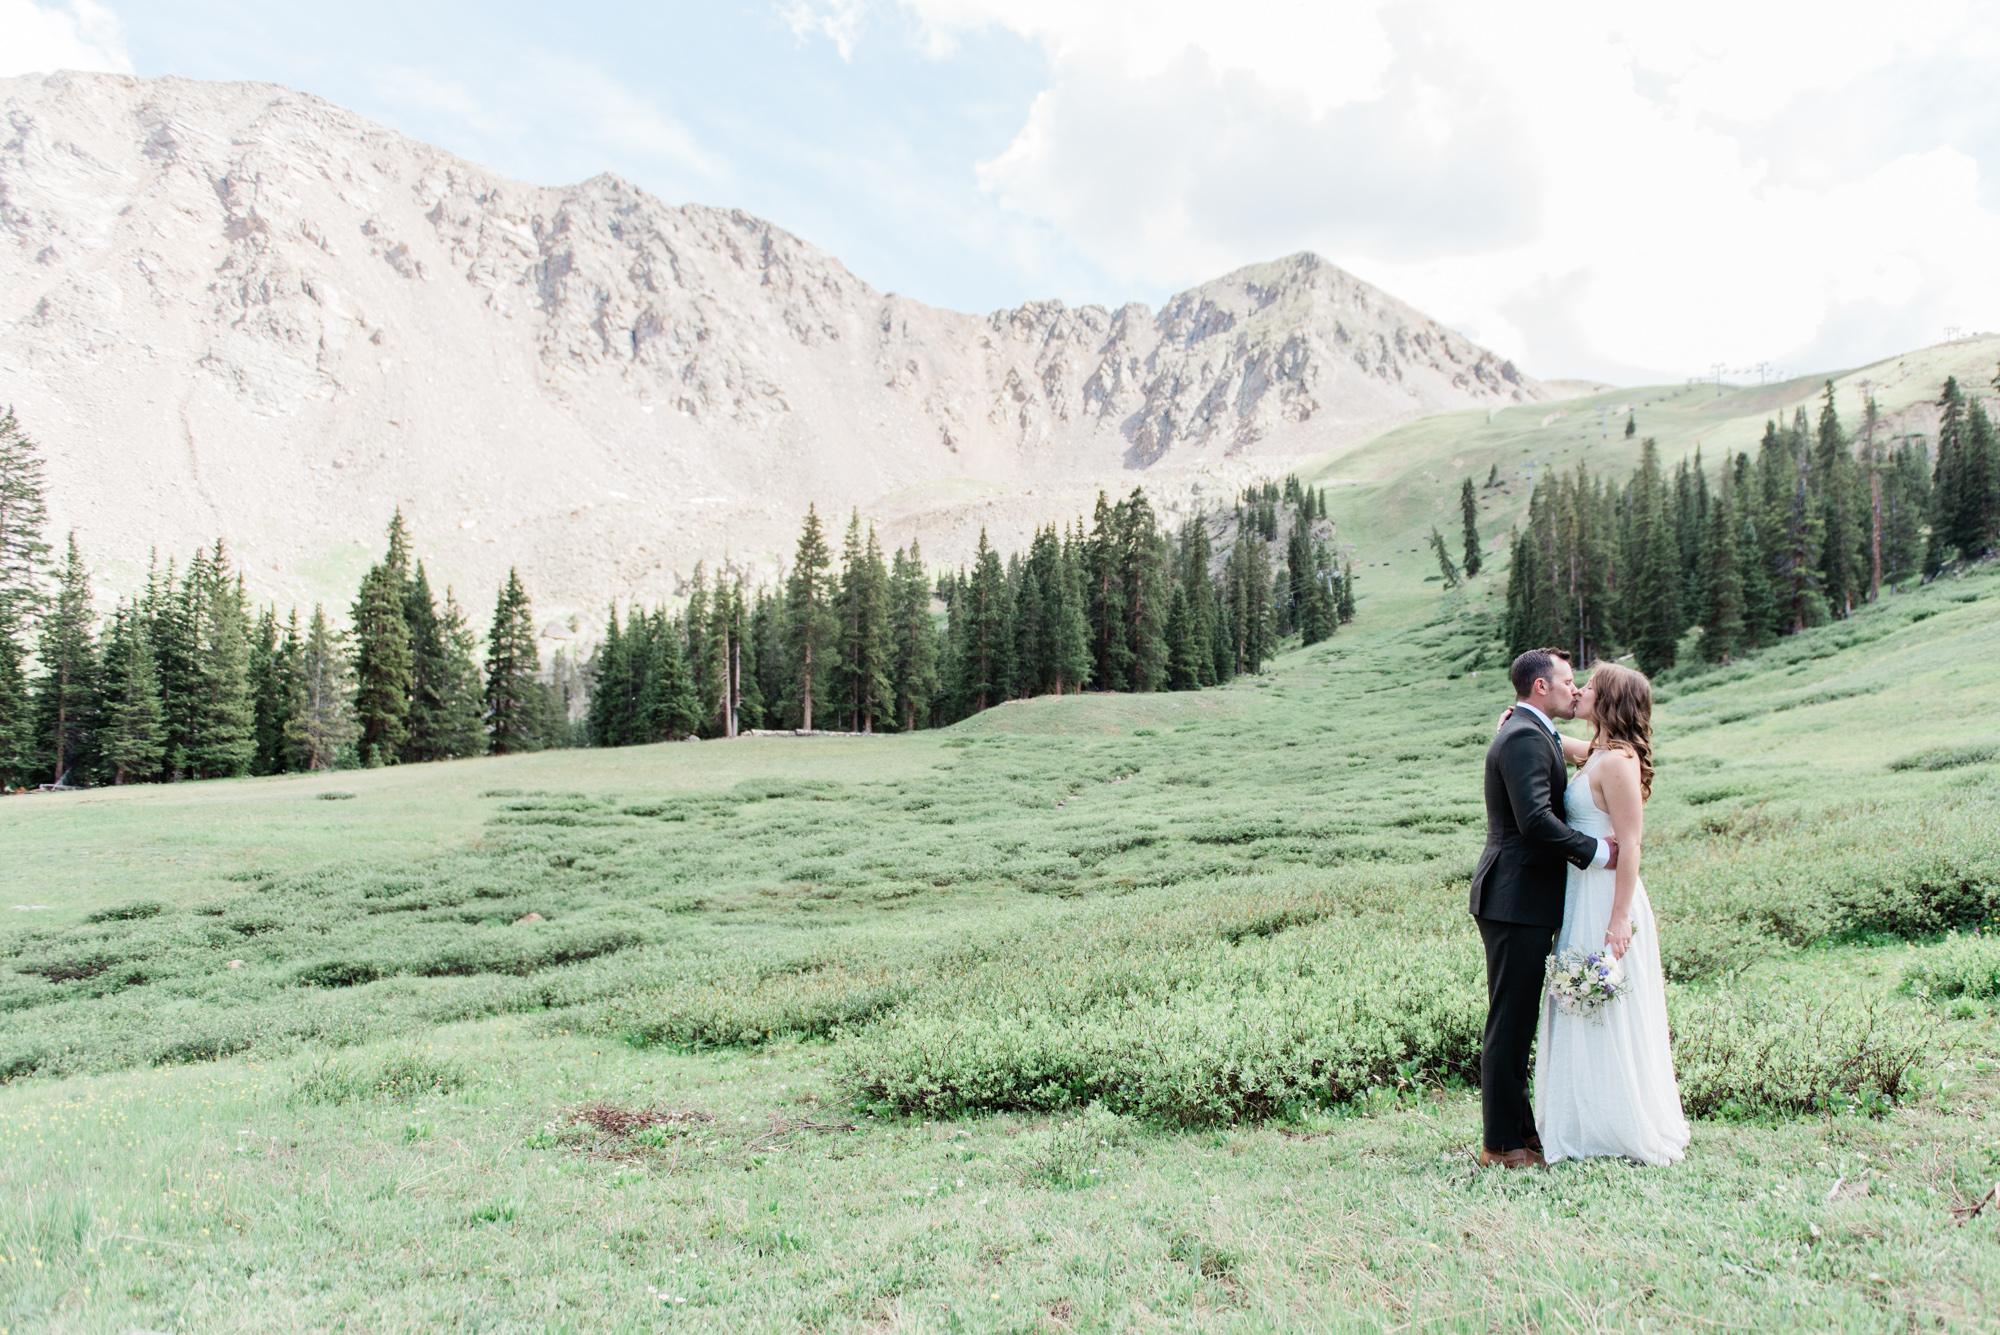 2019-08-09-Wedding-Kate-Hunter-ArapahoeBasin-1765.jpg